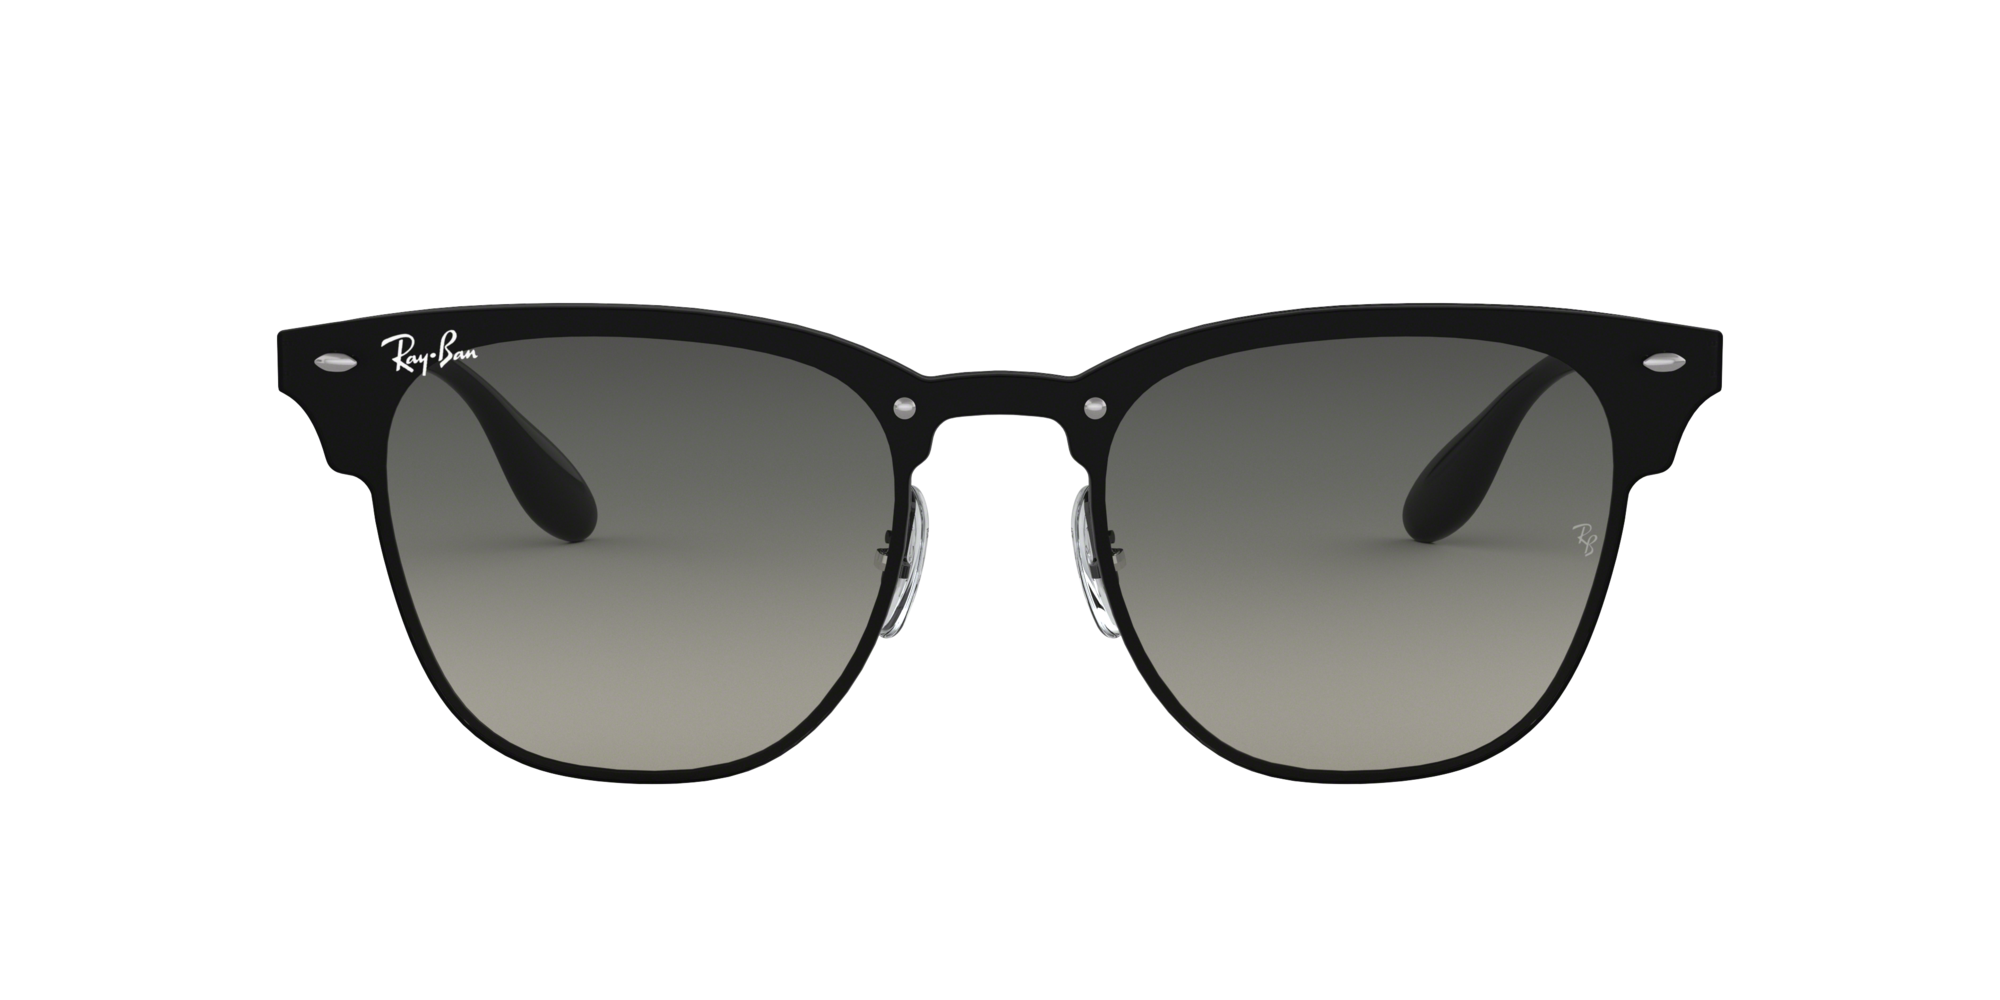 Image for RB3576N 47 BLAZE CLUBMASTER from LensCrafters | Glasses, Prescription Glasses Online, Eyewear